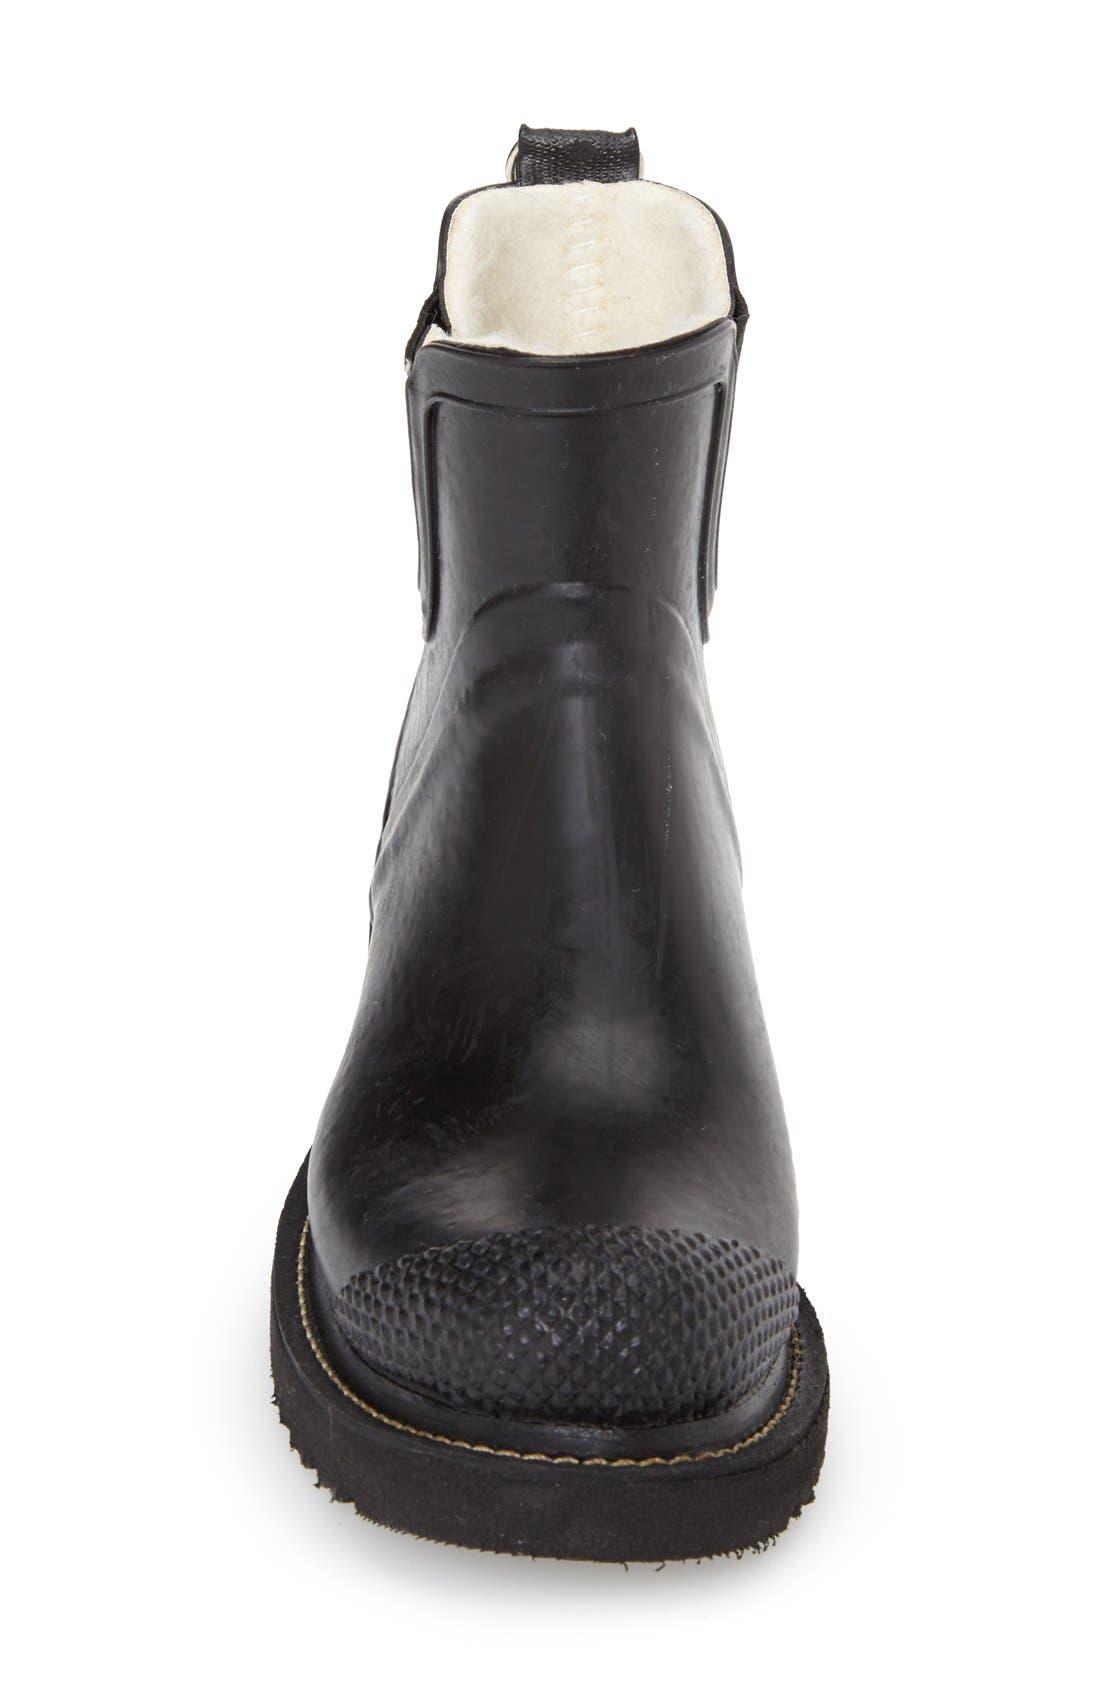 'RUB 47' Short Waterproof Rain Boot,                             Alternate thumbnail 3, color,                             001